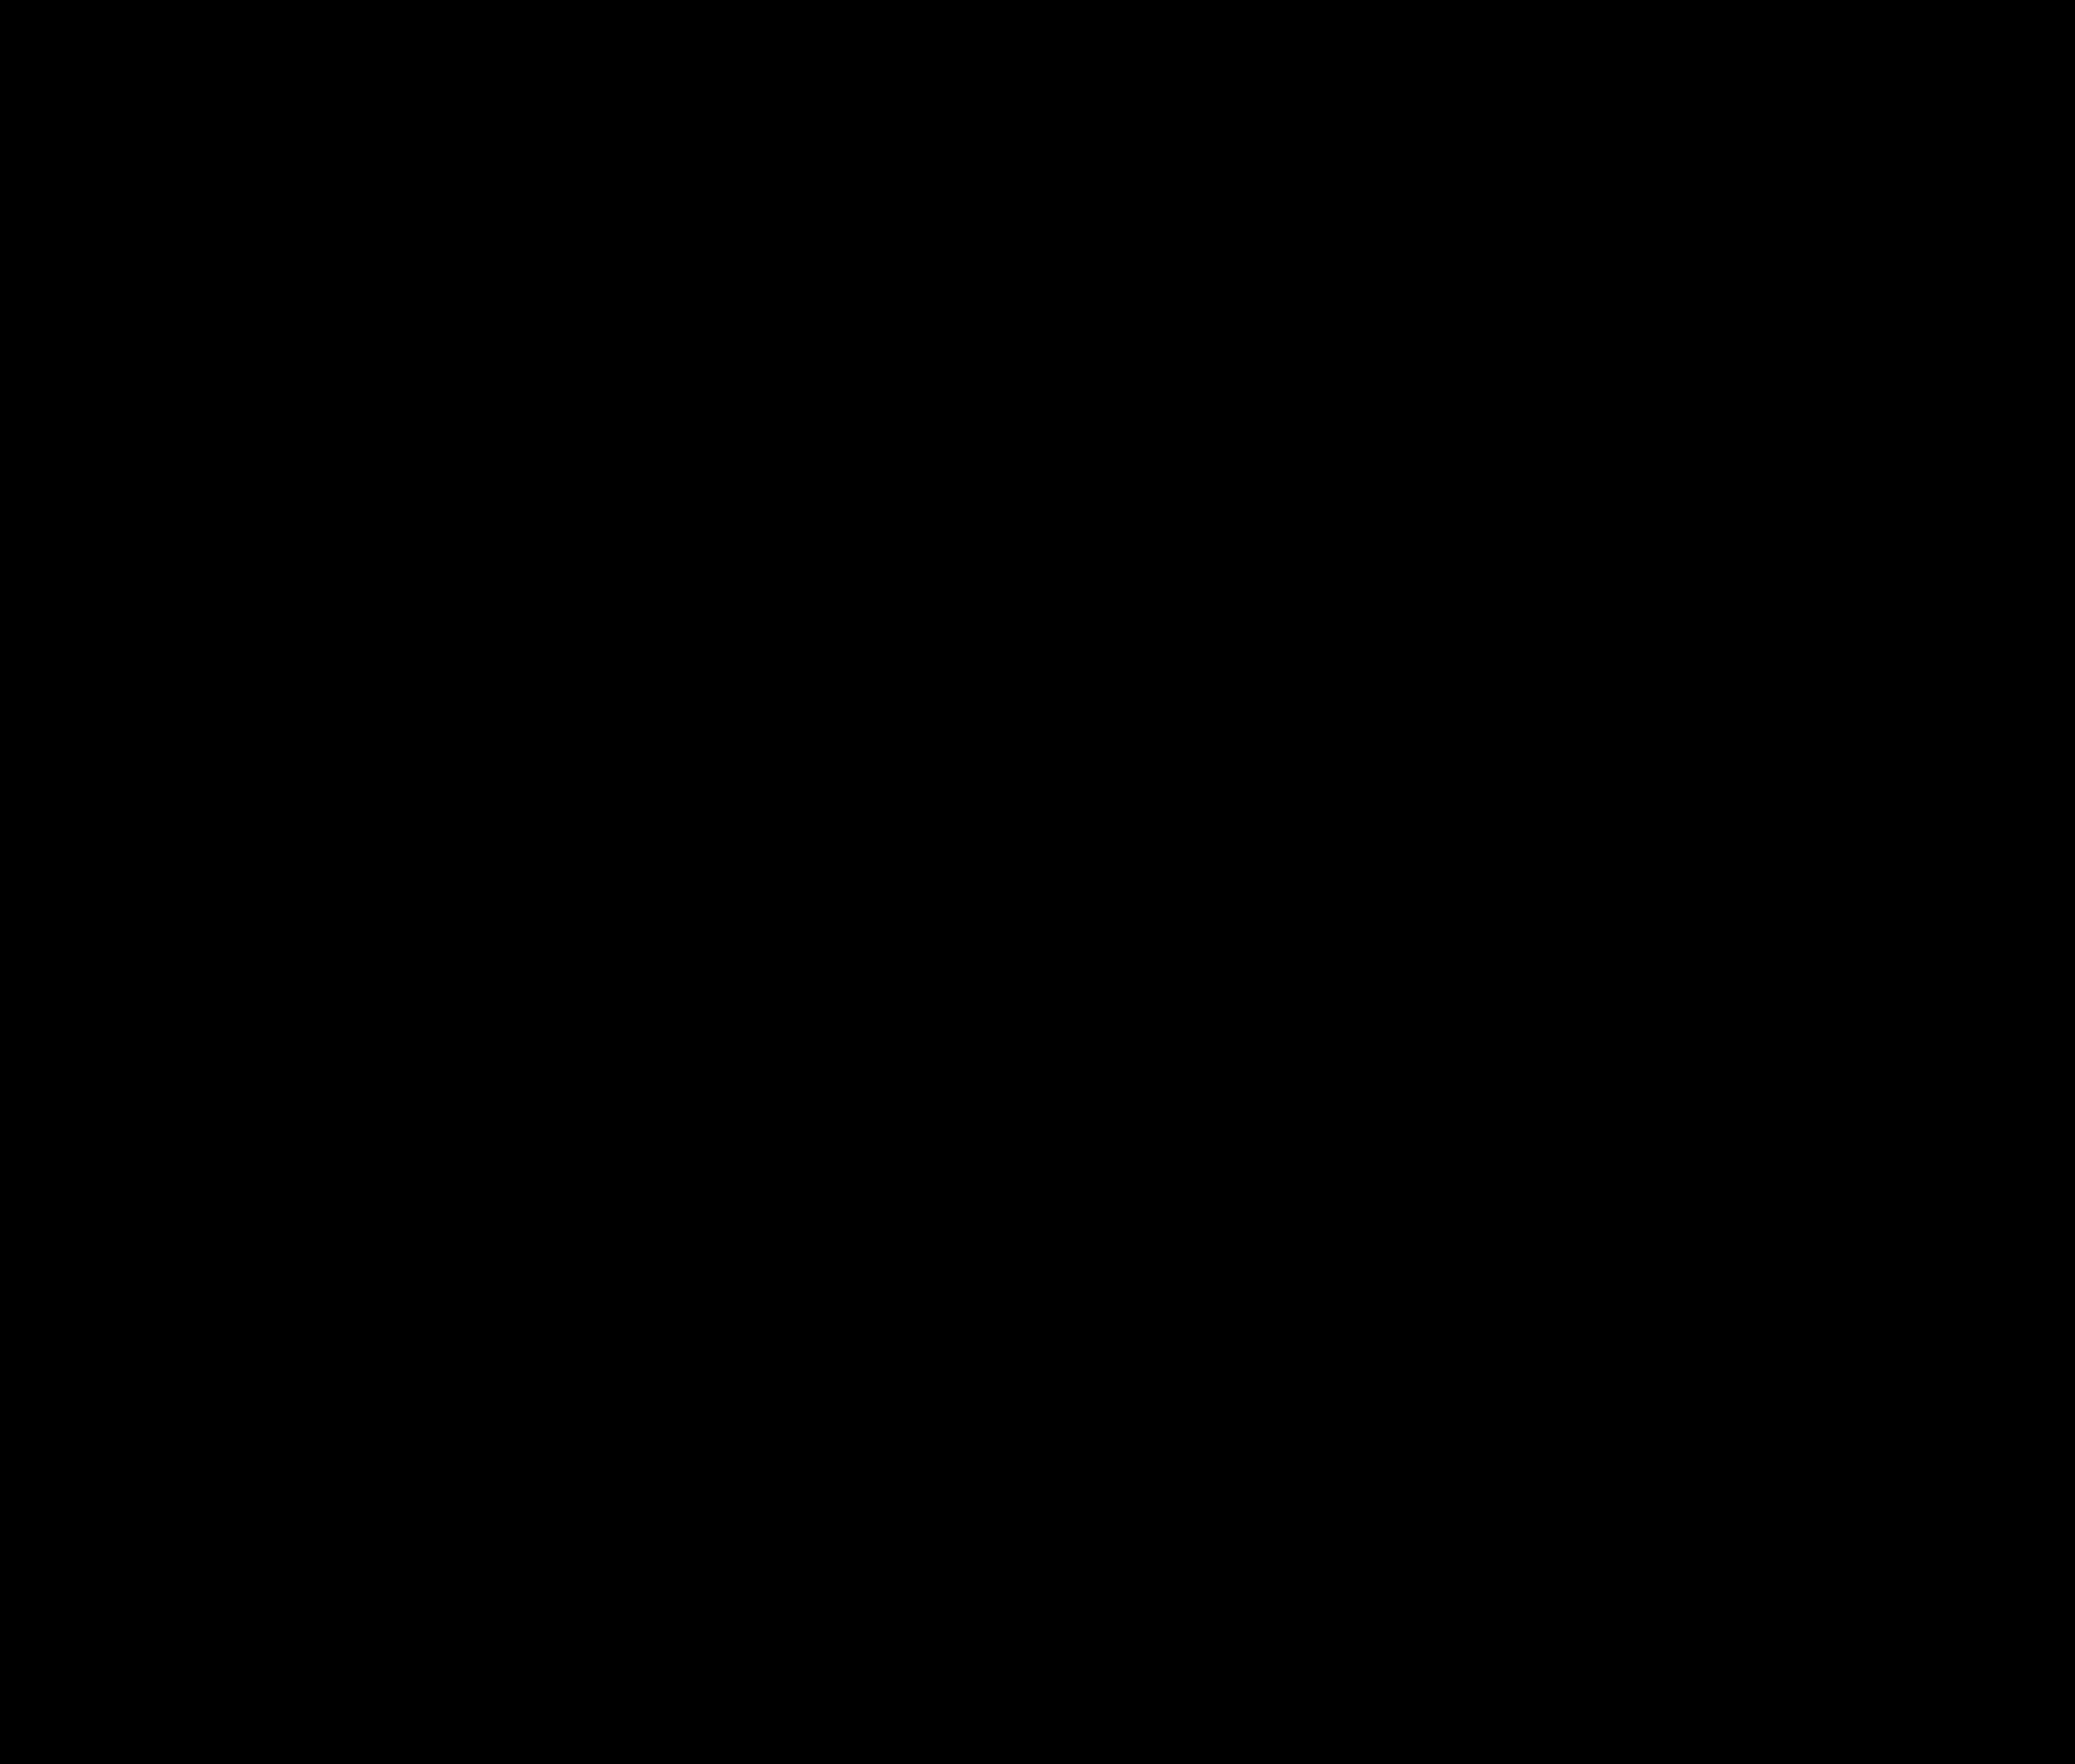 Gay symbol big image. Marriage clipart sign